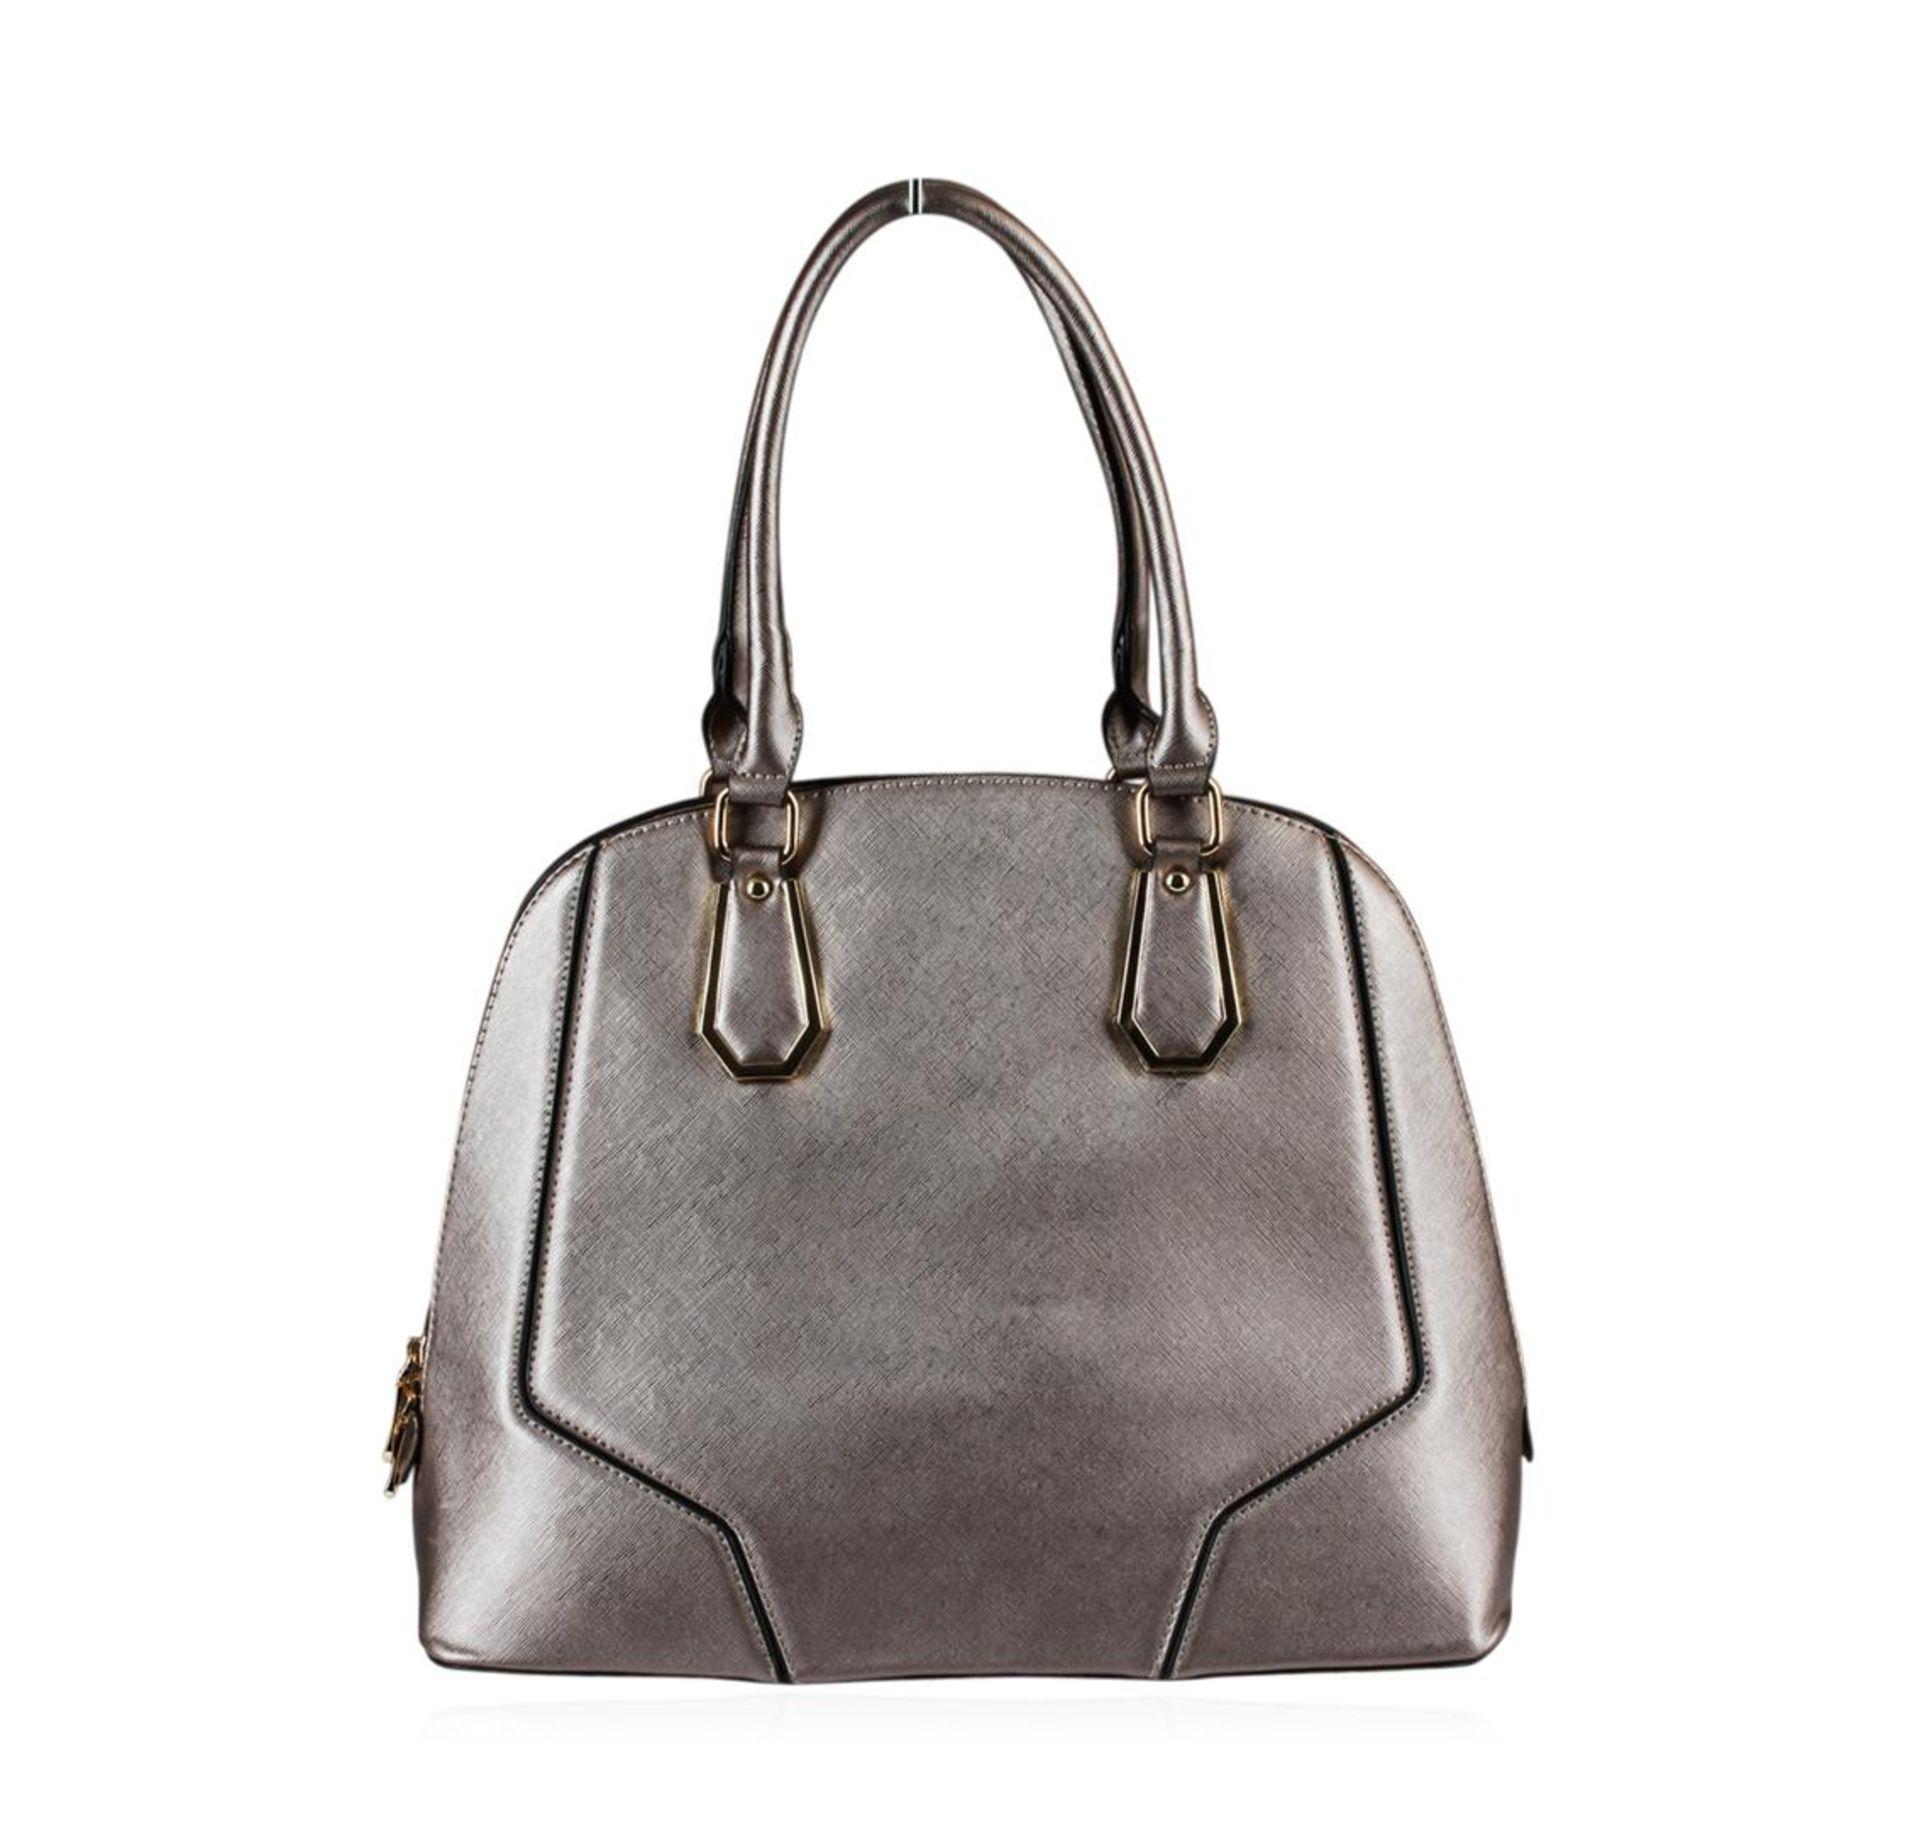 Metallic Silver Rush Handbag - Image 2 of 3